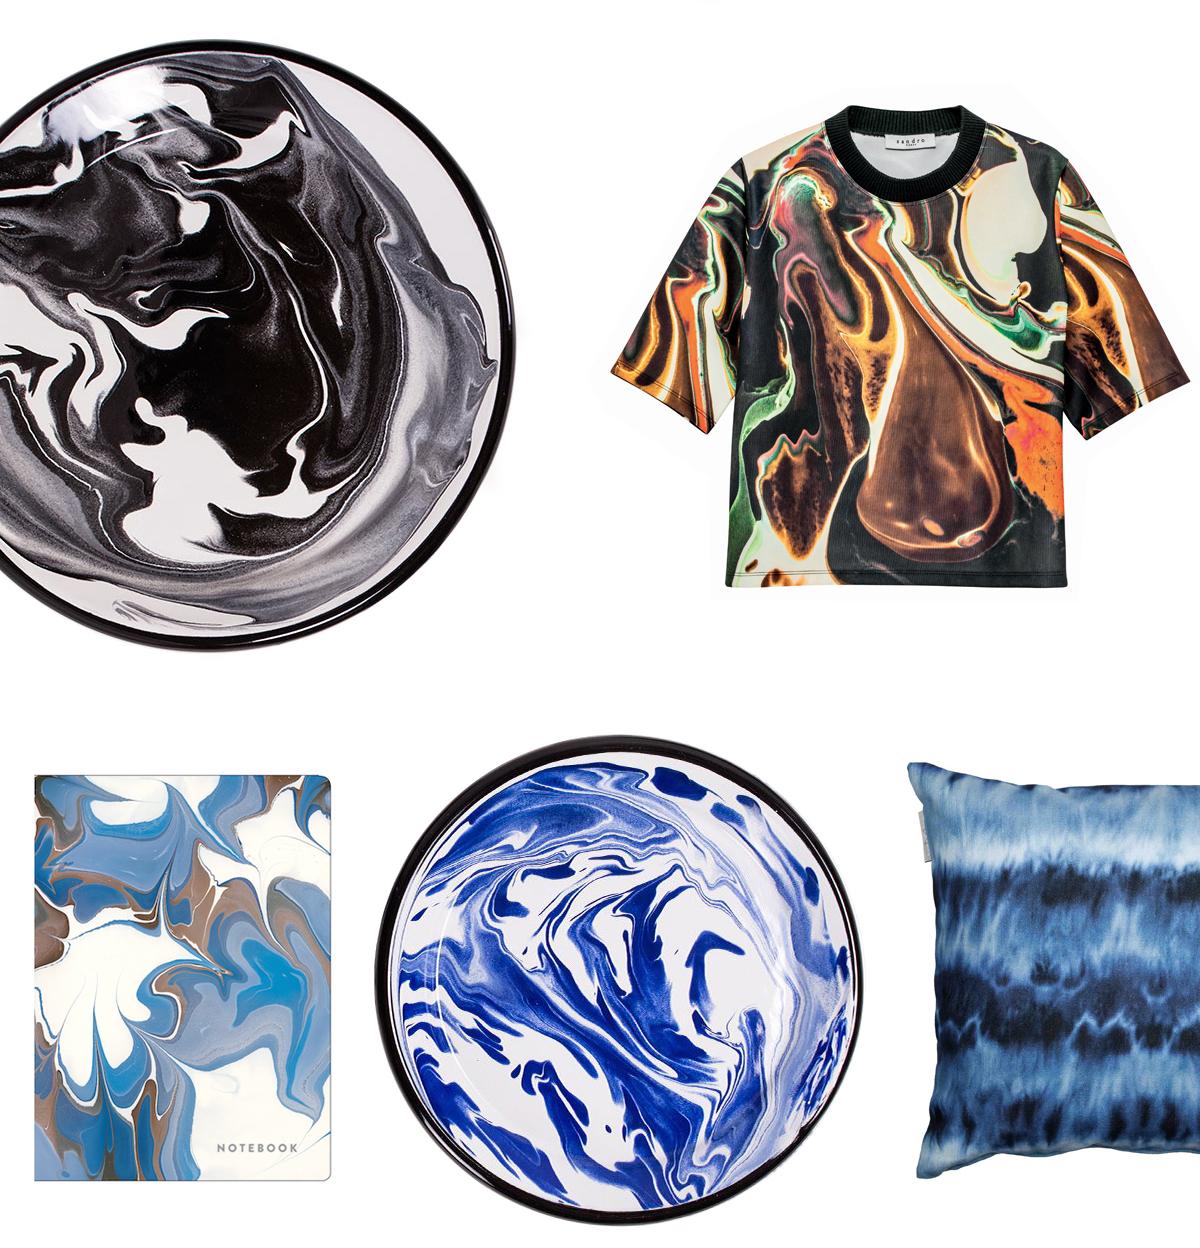 marble-trend-galison-notebook-marble-paper-ebru-marbre-fashion-interior-design-decor